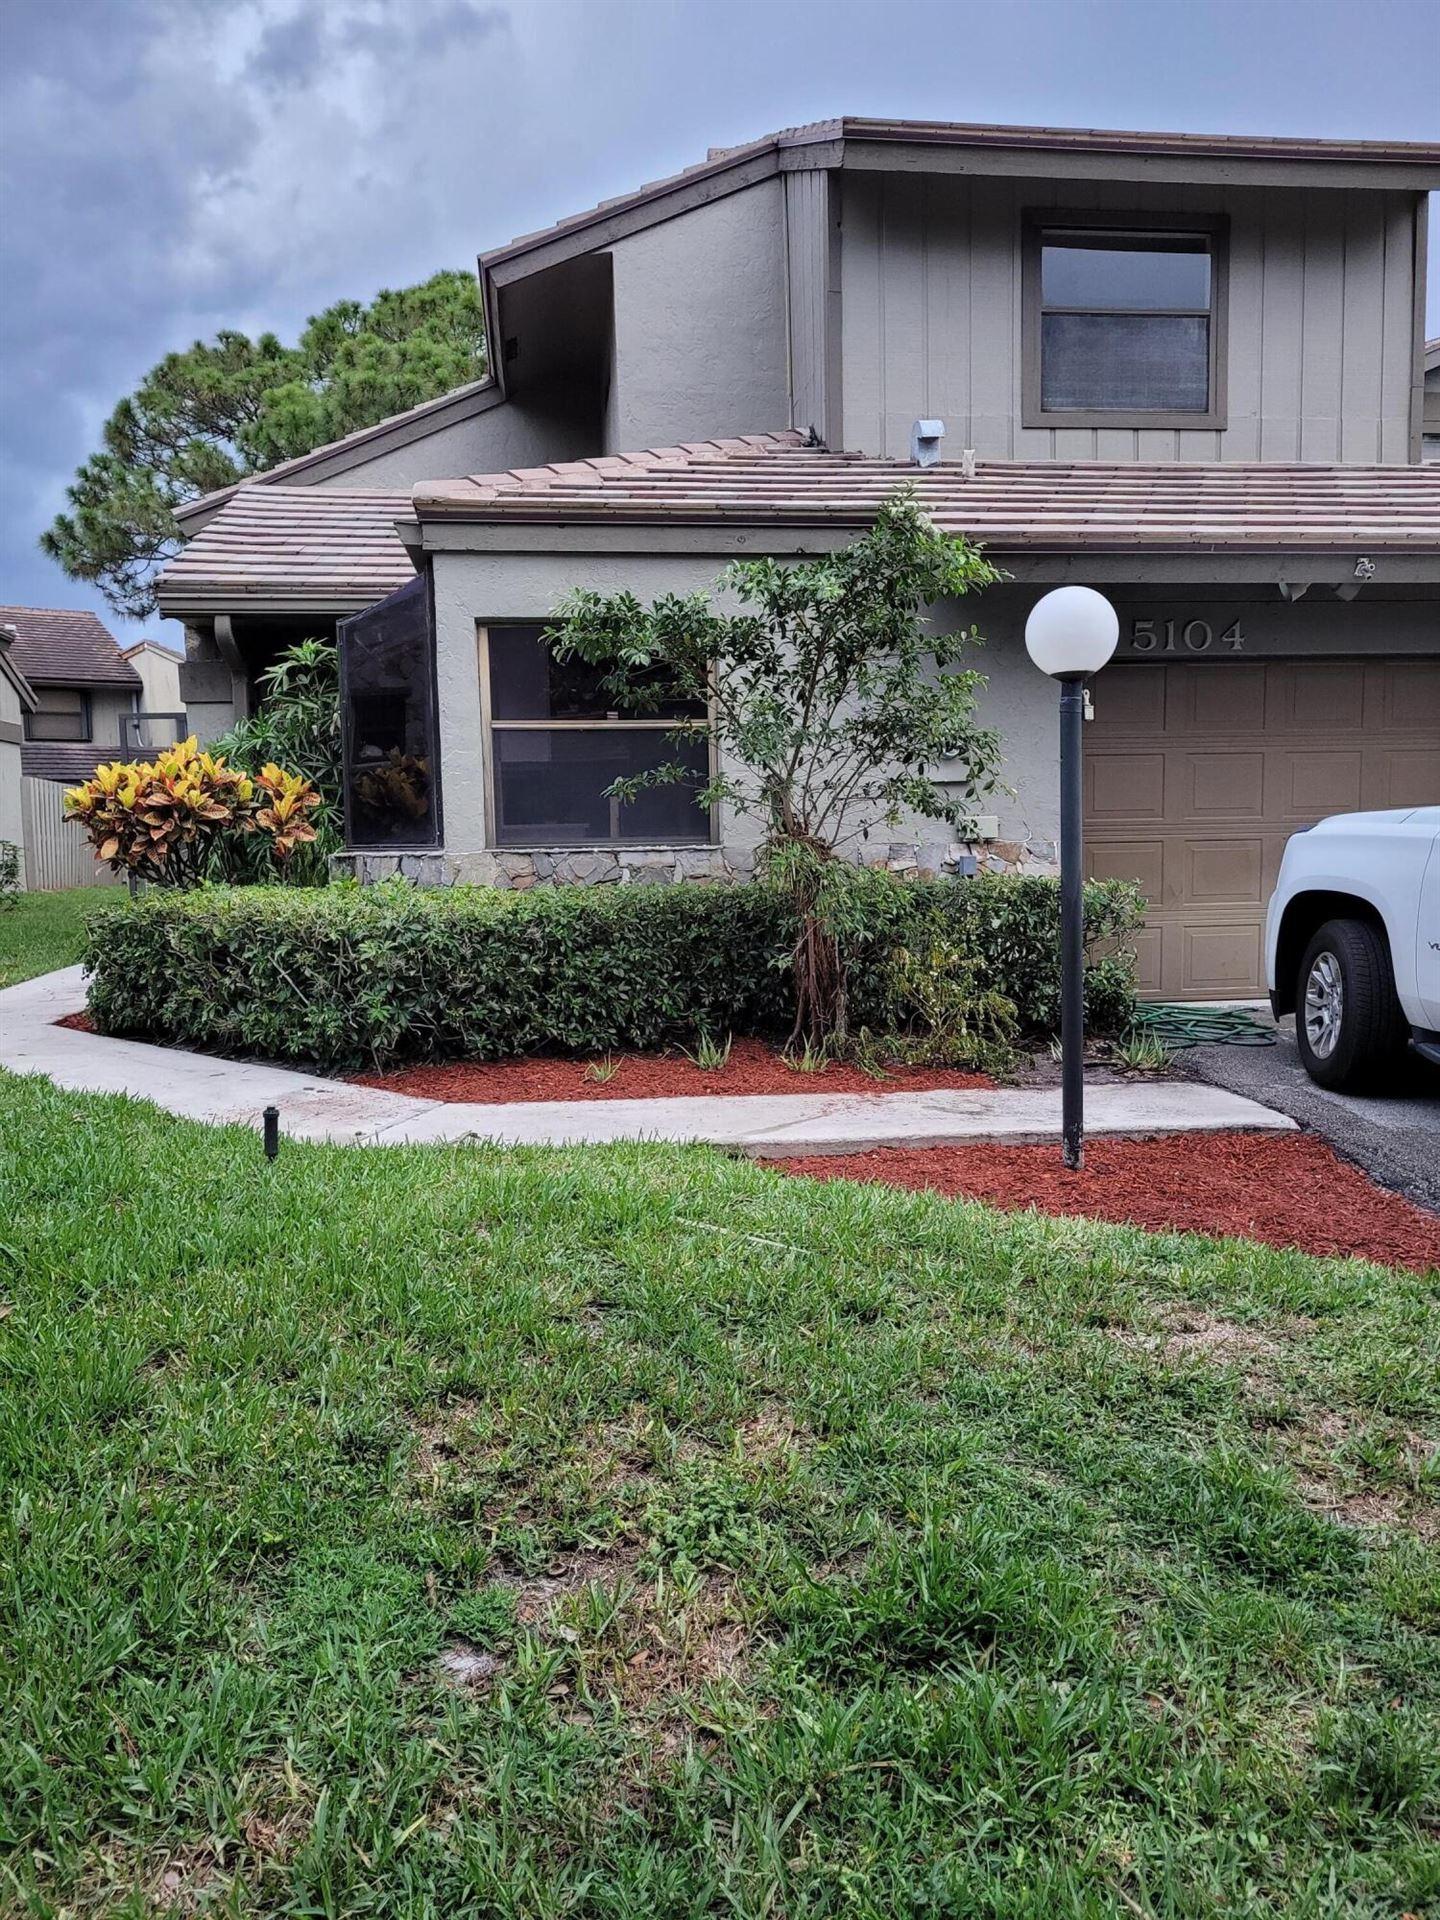 Photo of 5104 Thyme Drive, Palm Beach Gardens, FL 33418 (MLS # RX-10725711)